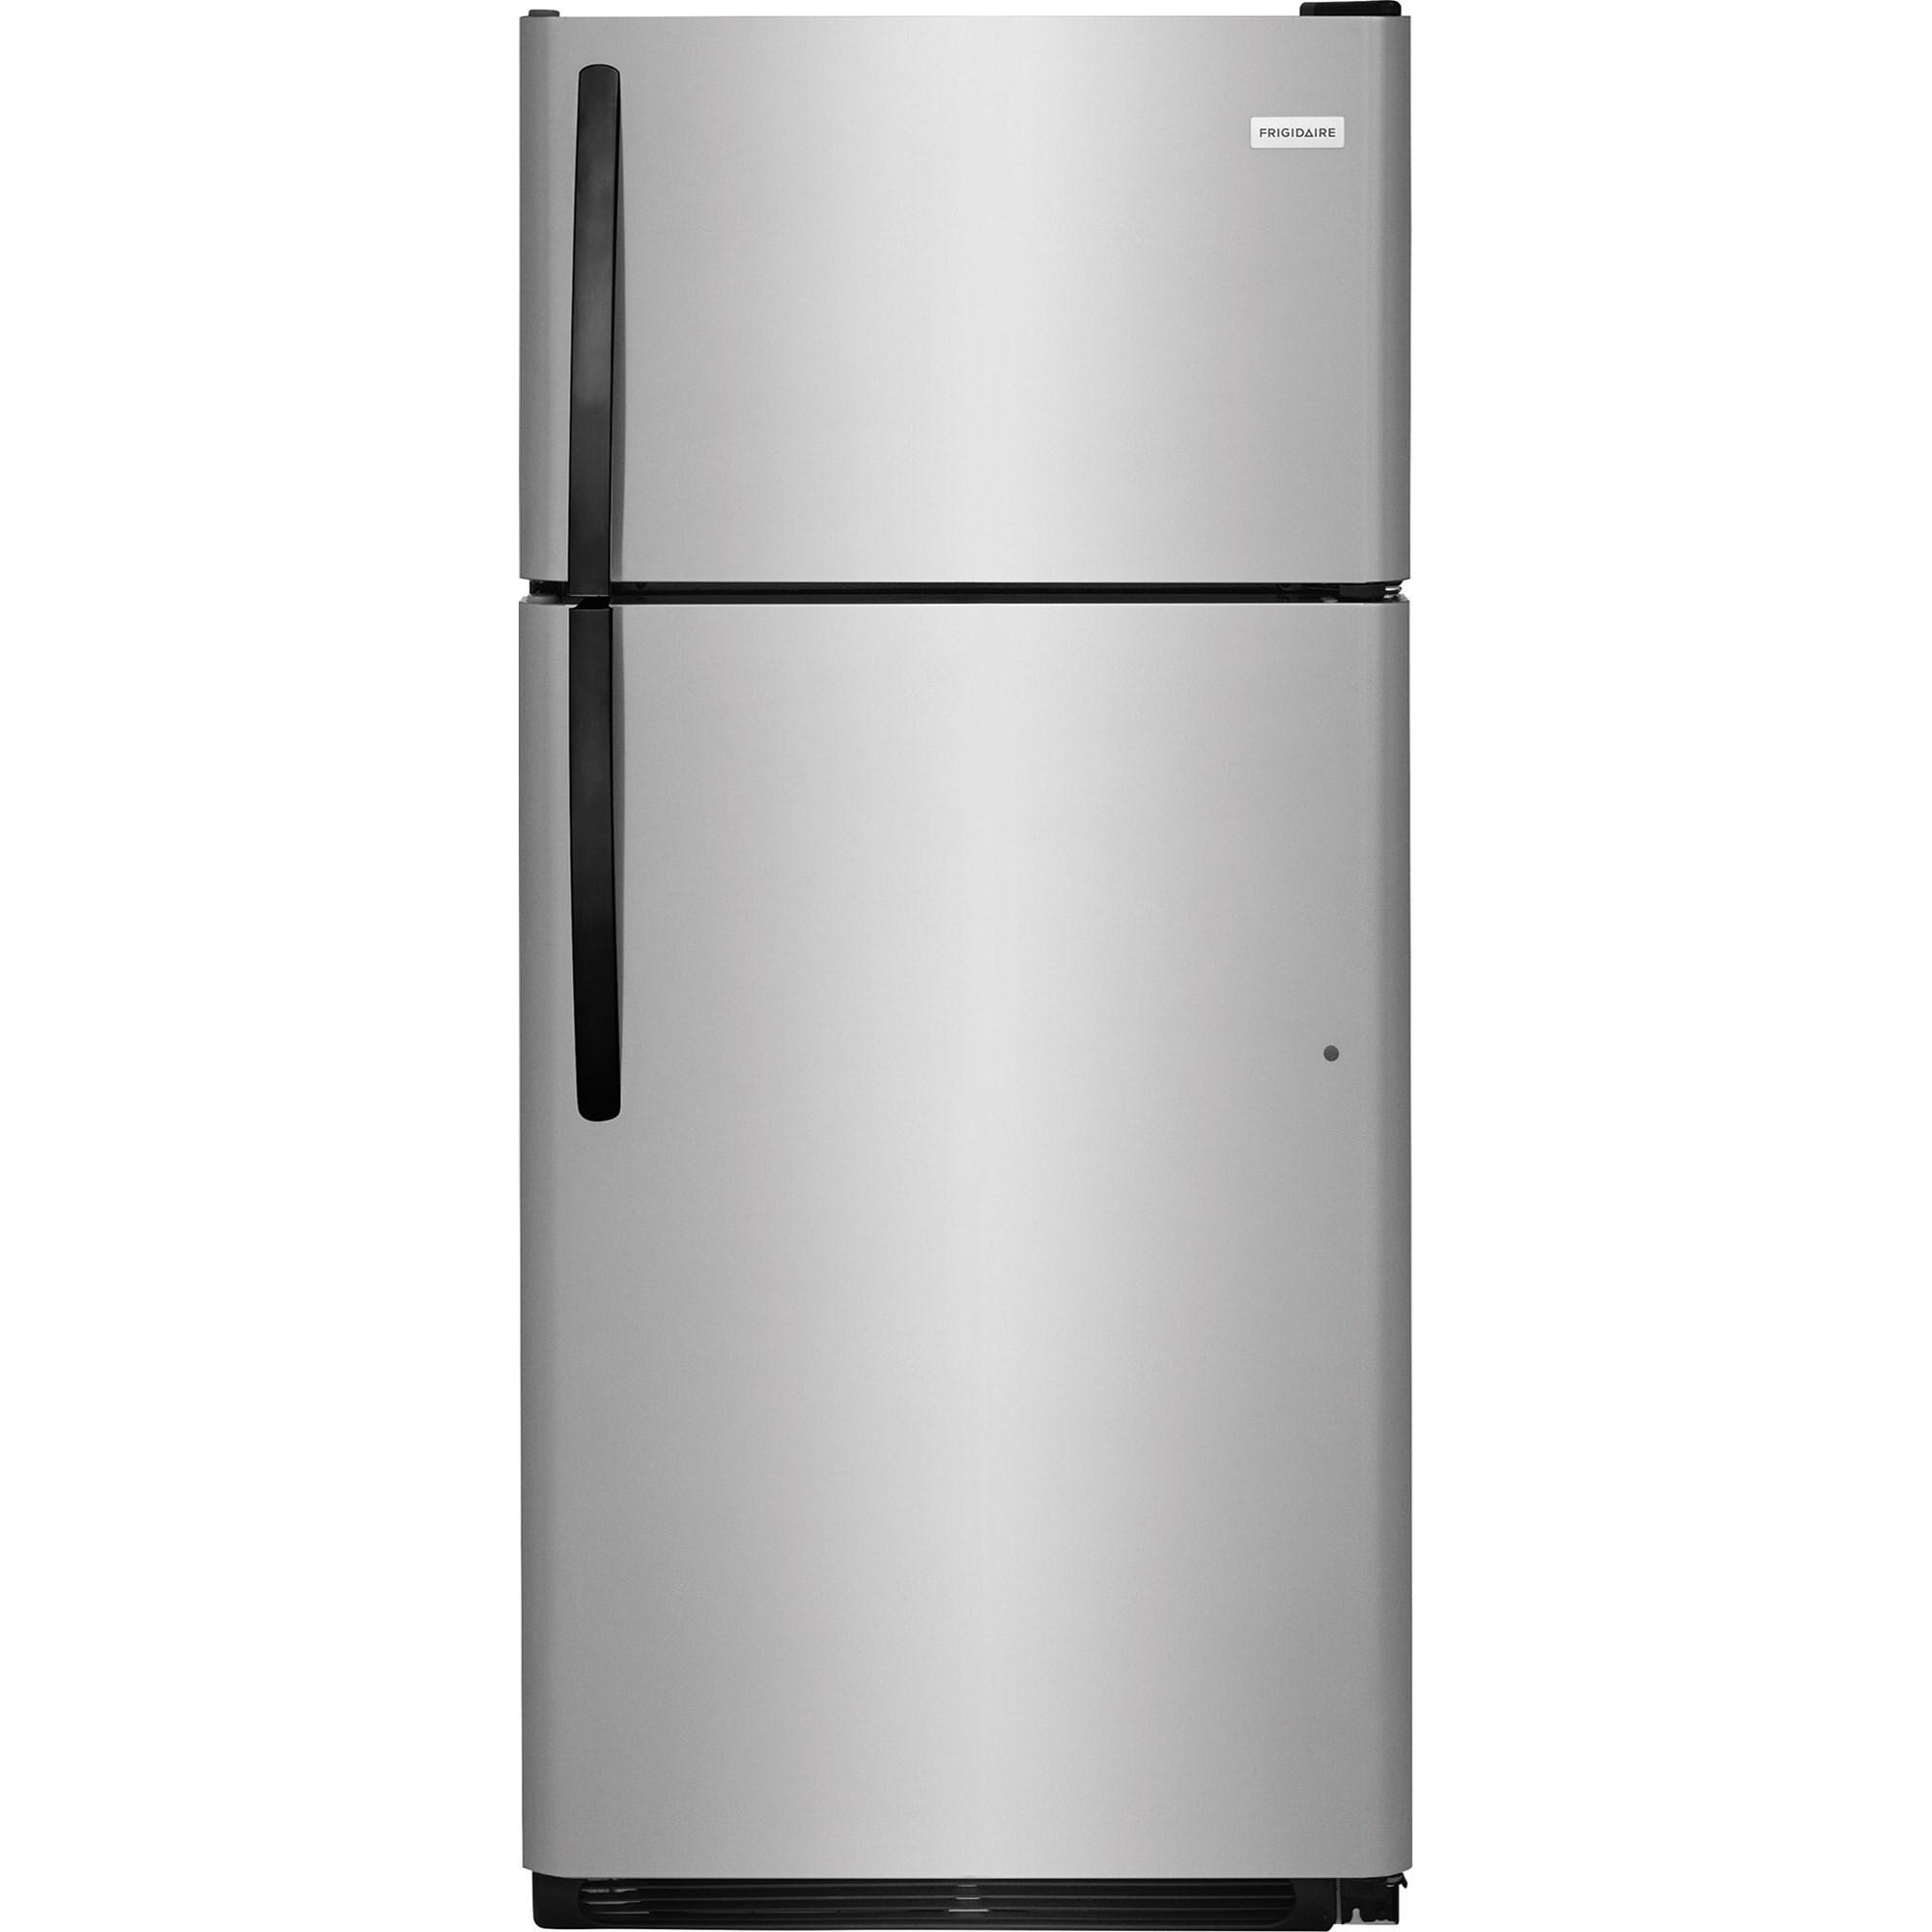 frigidaire fftr1814ts18 cu ft top freezer refrigerator del sol furniture refrigerator. Black Bedroom Furniture Sets. Home Design Ideas